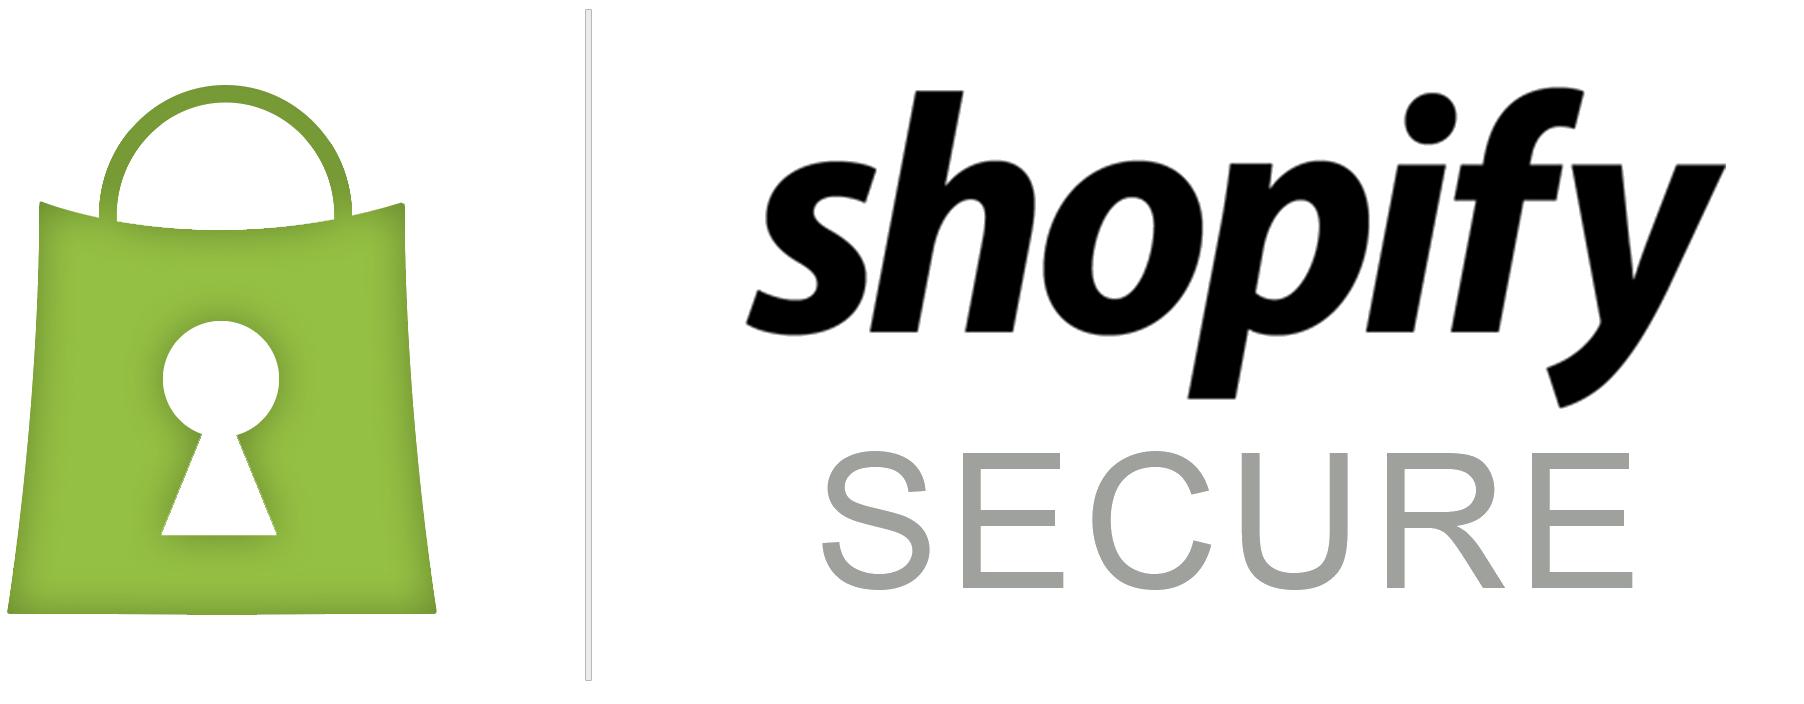 Shopify-secure-dark